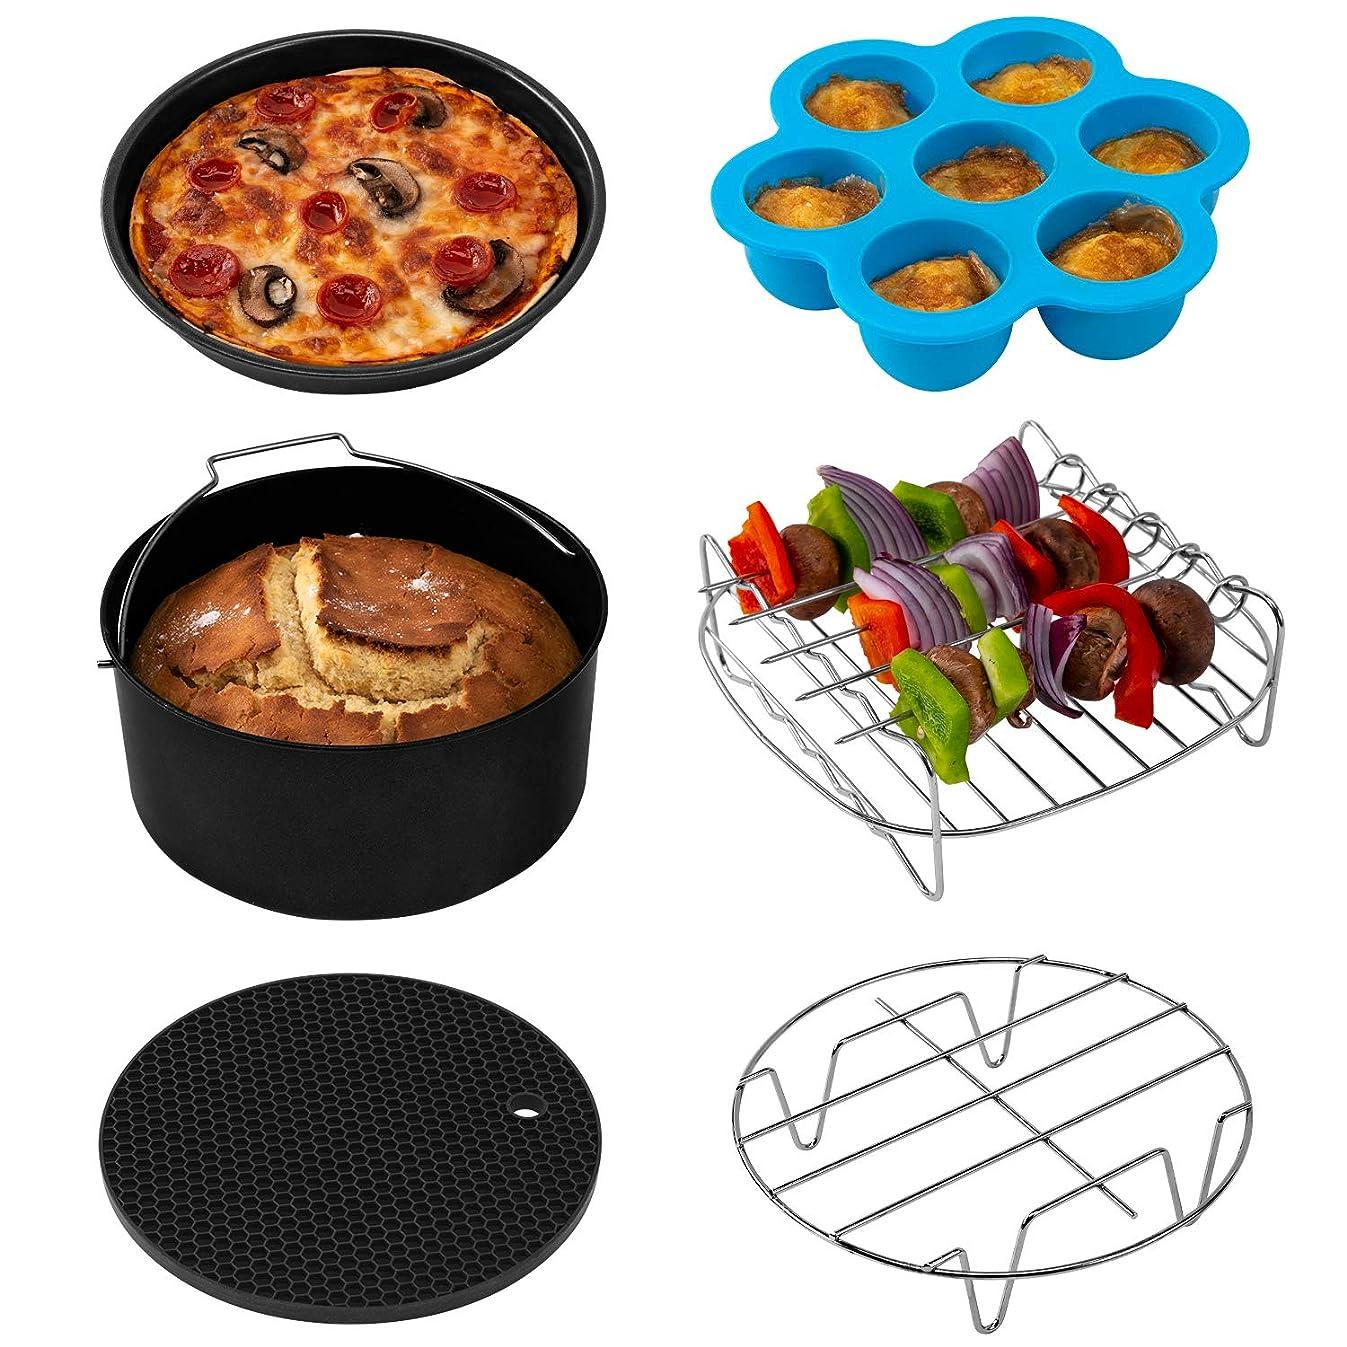 COSORI Air Fryer Accessories XL (C158-6AC), Set of 6 Fit all 5.3Qt, 5.8Qt, 6Qt Air Fryer, FDA Compliant, BPA Free, Dishwasher Safe, Nonstick Coating, 2-Year Warranty